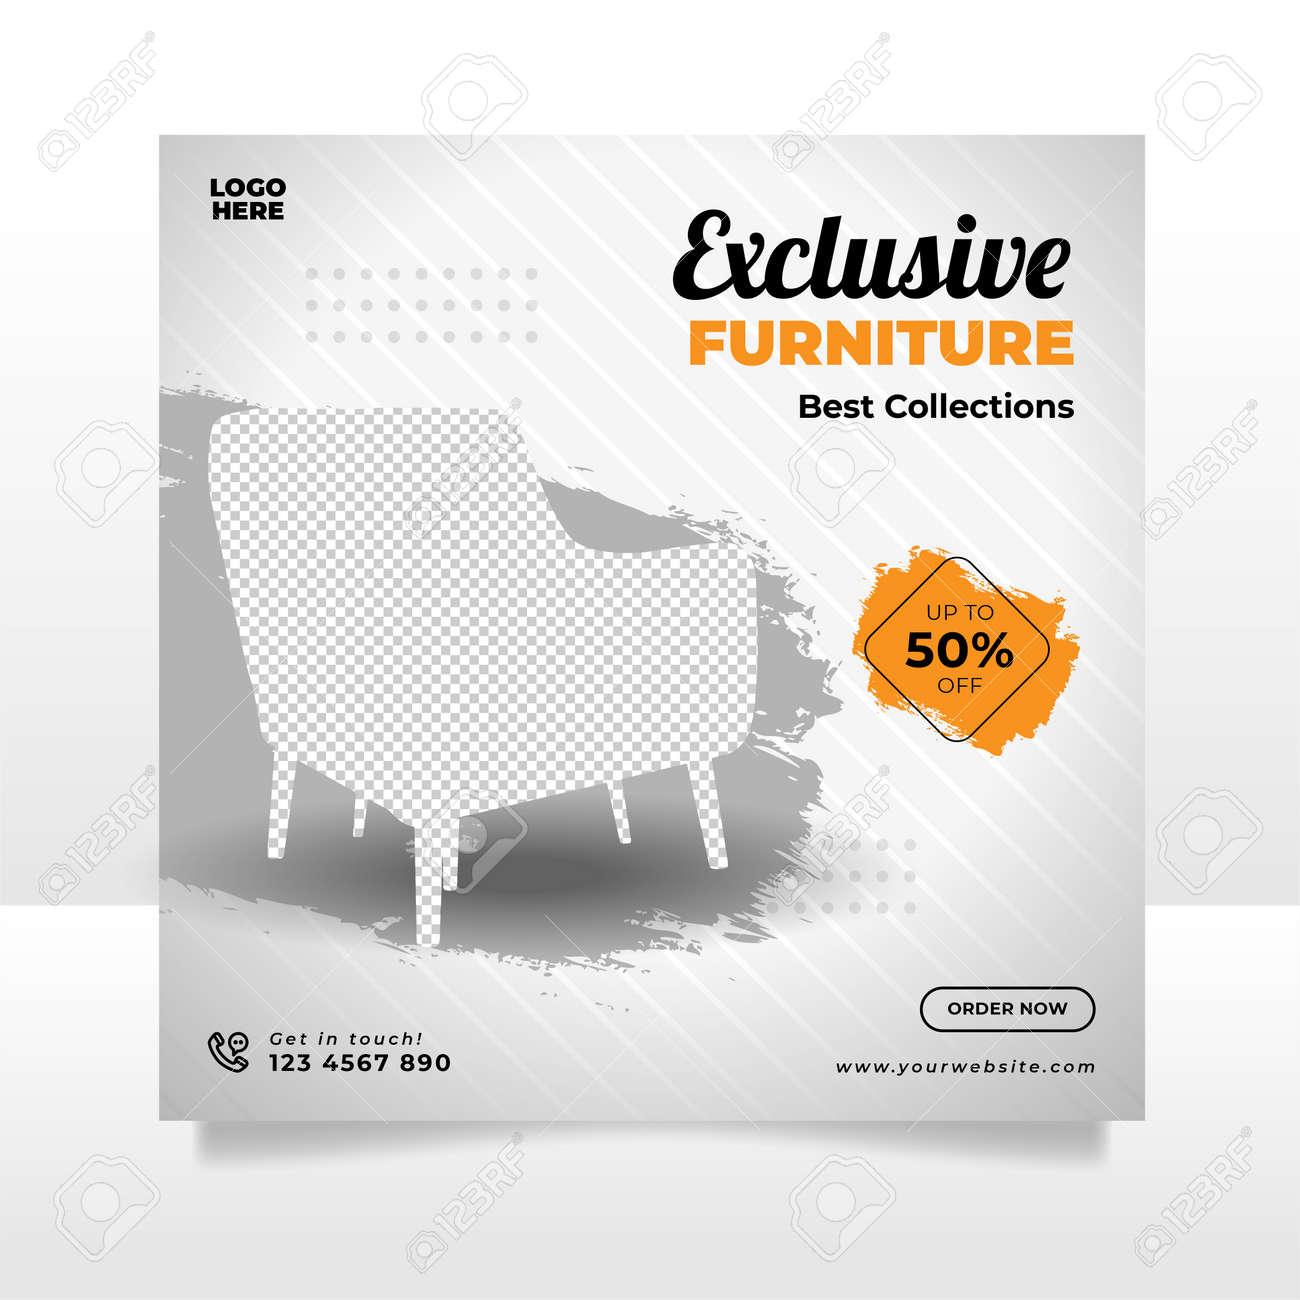 Minimalist furniture sale banner or social media post template - 166850214